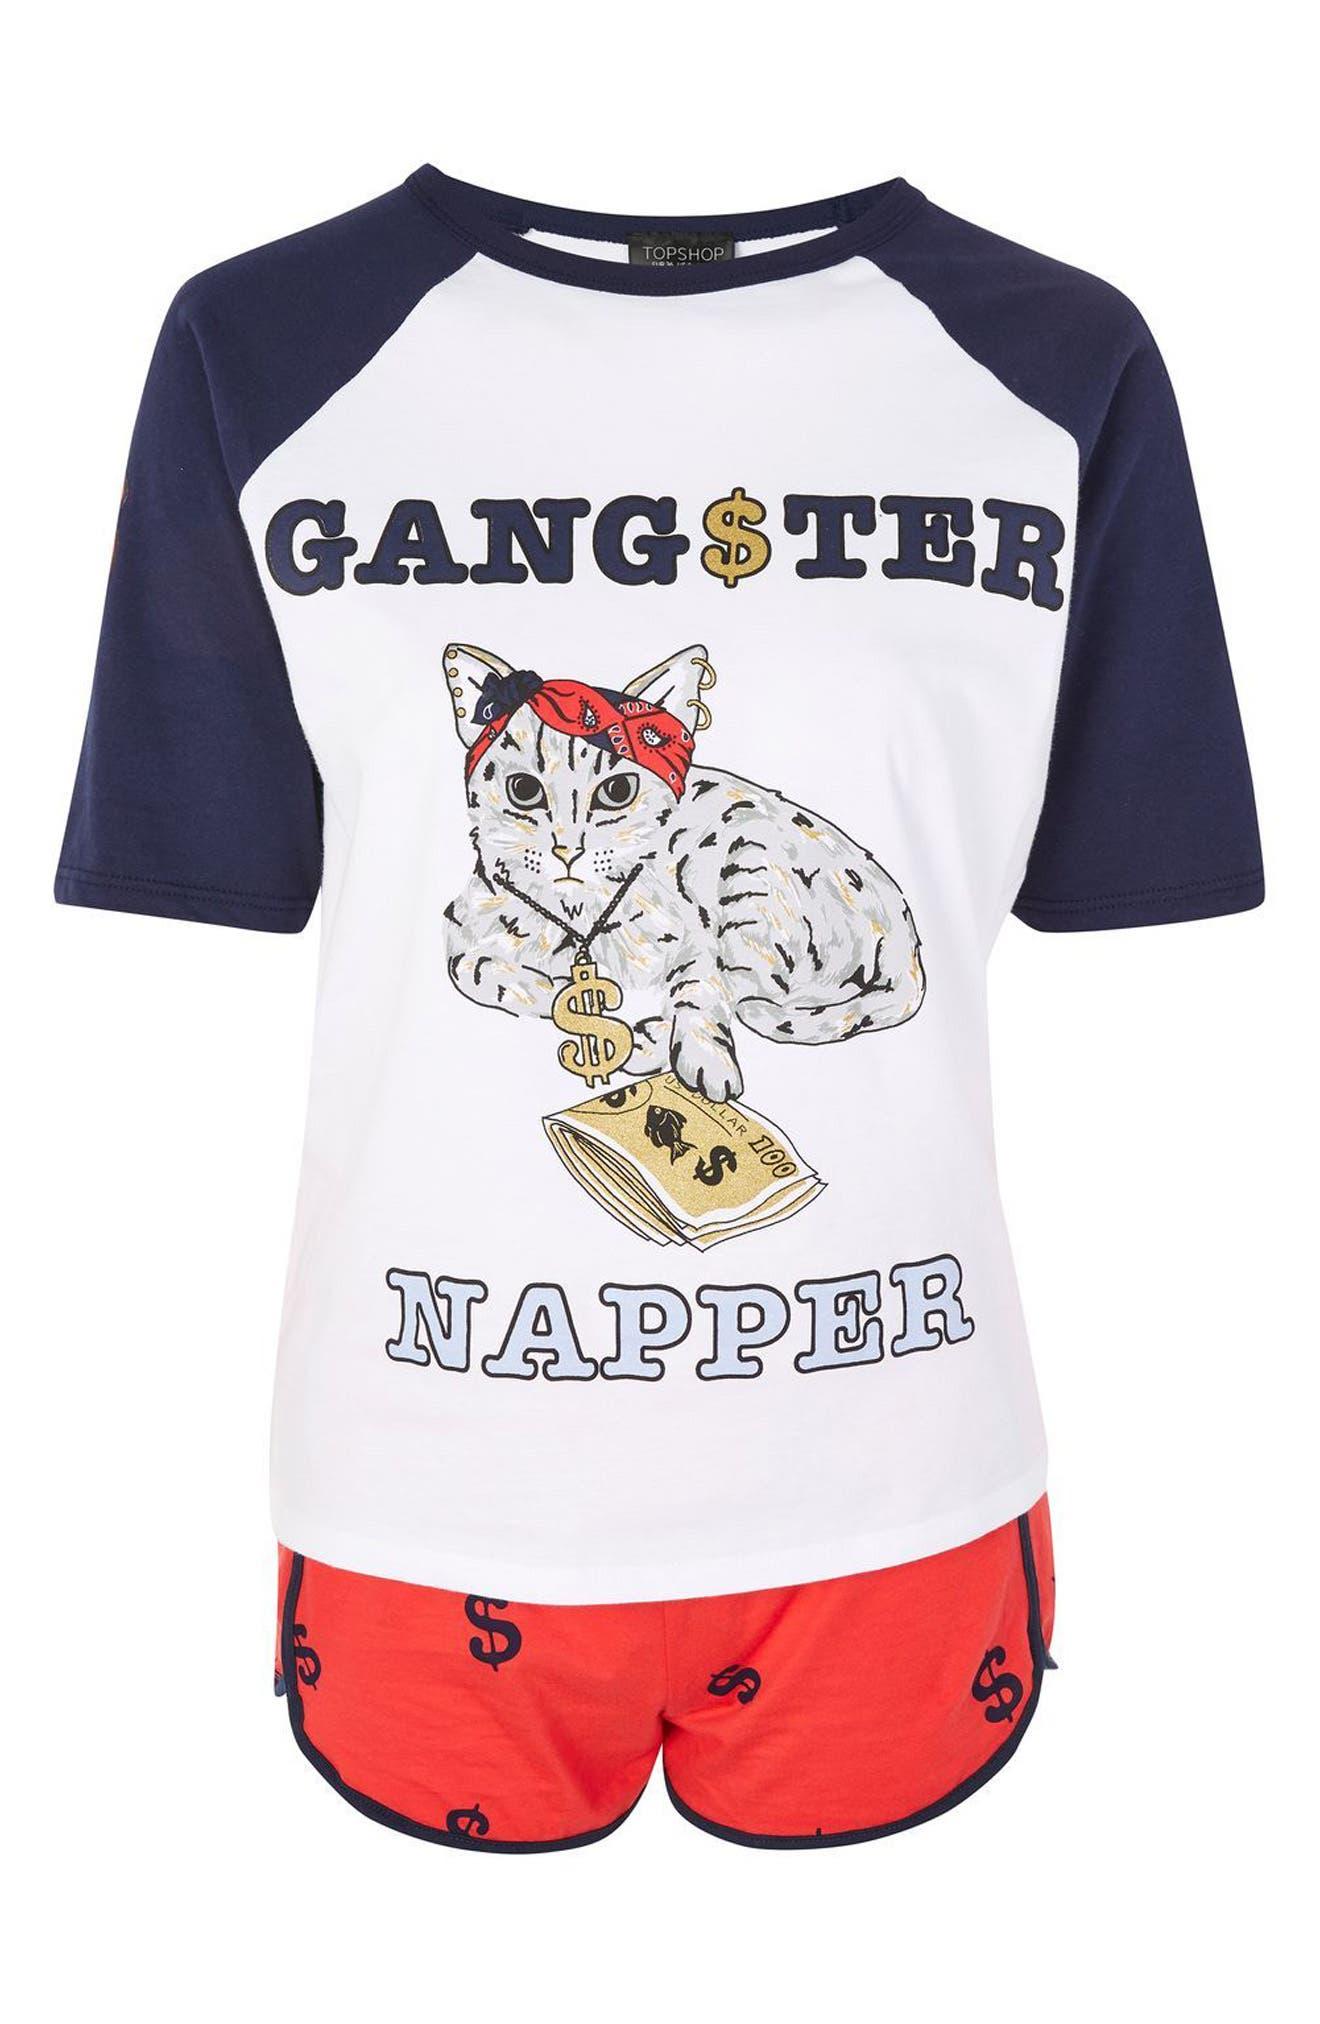 Gangster Napper Pajamas,                             Alternate thumbnail 3, color,                             410